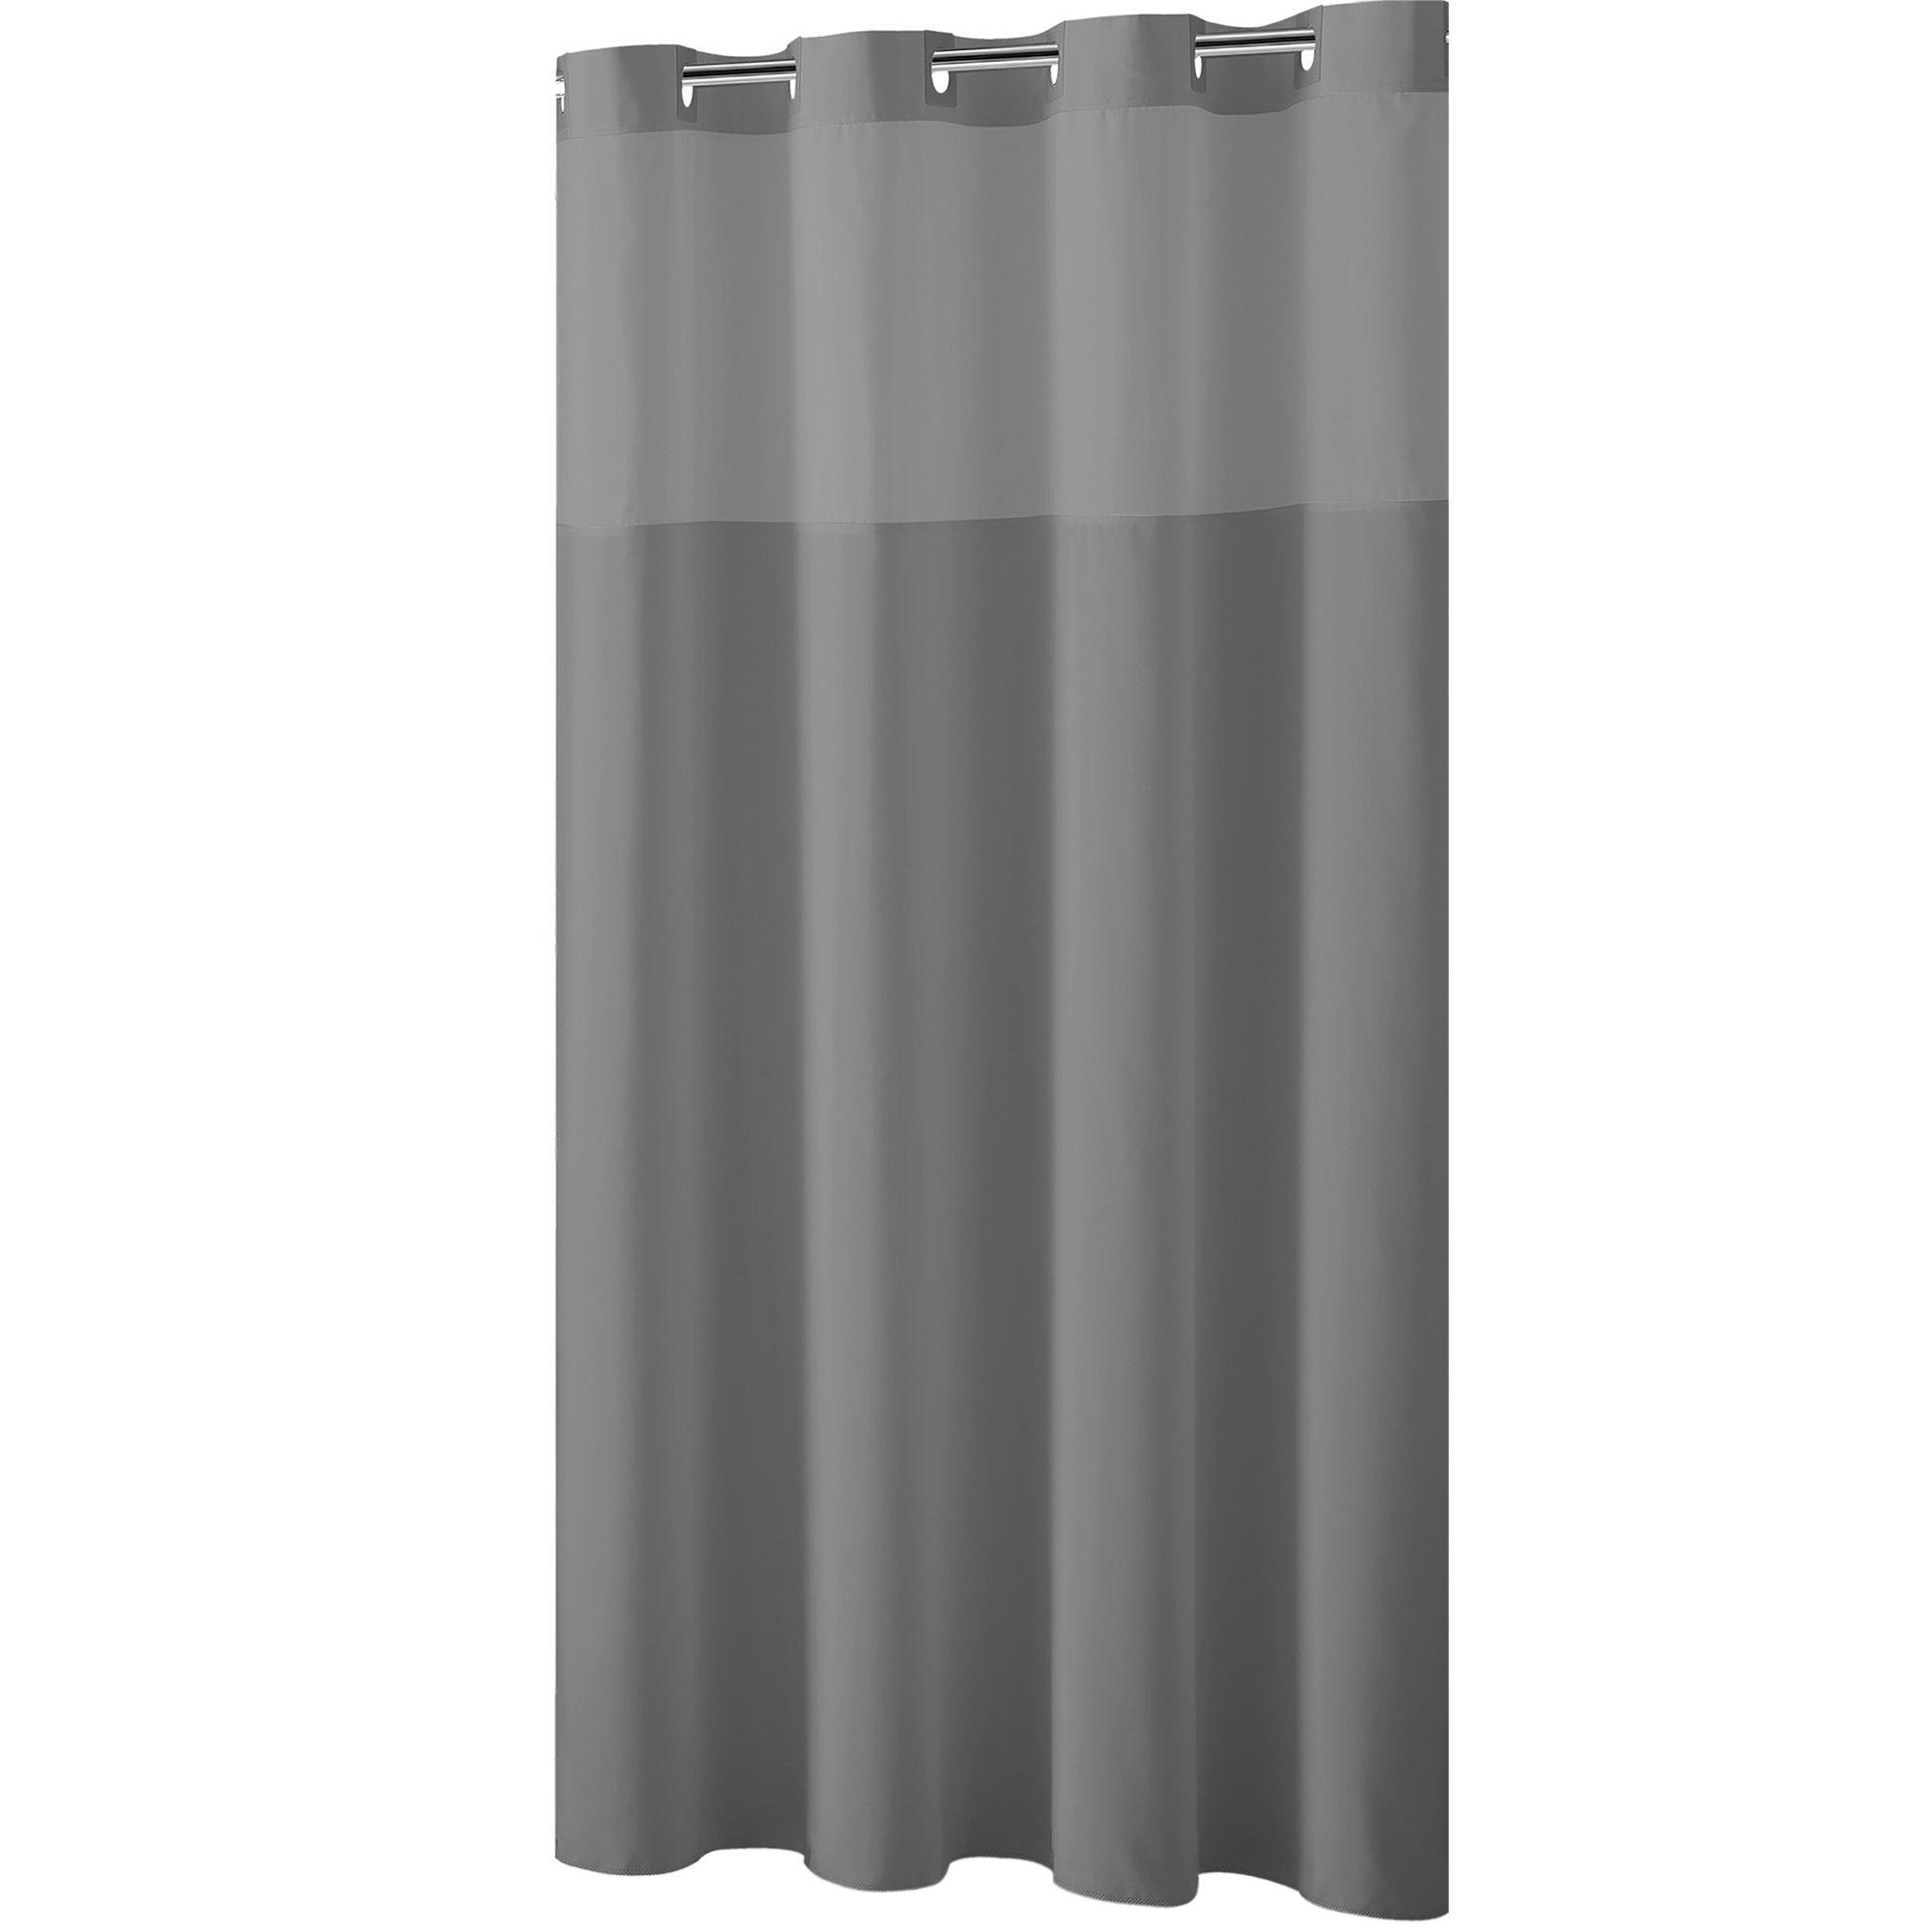 Hookless Shower Curtain Plain Weave Frost Grey Grey Gray In